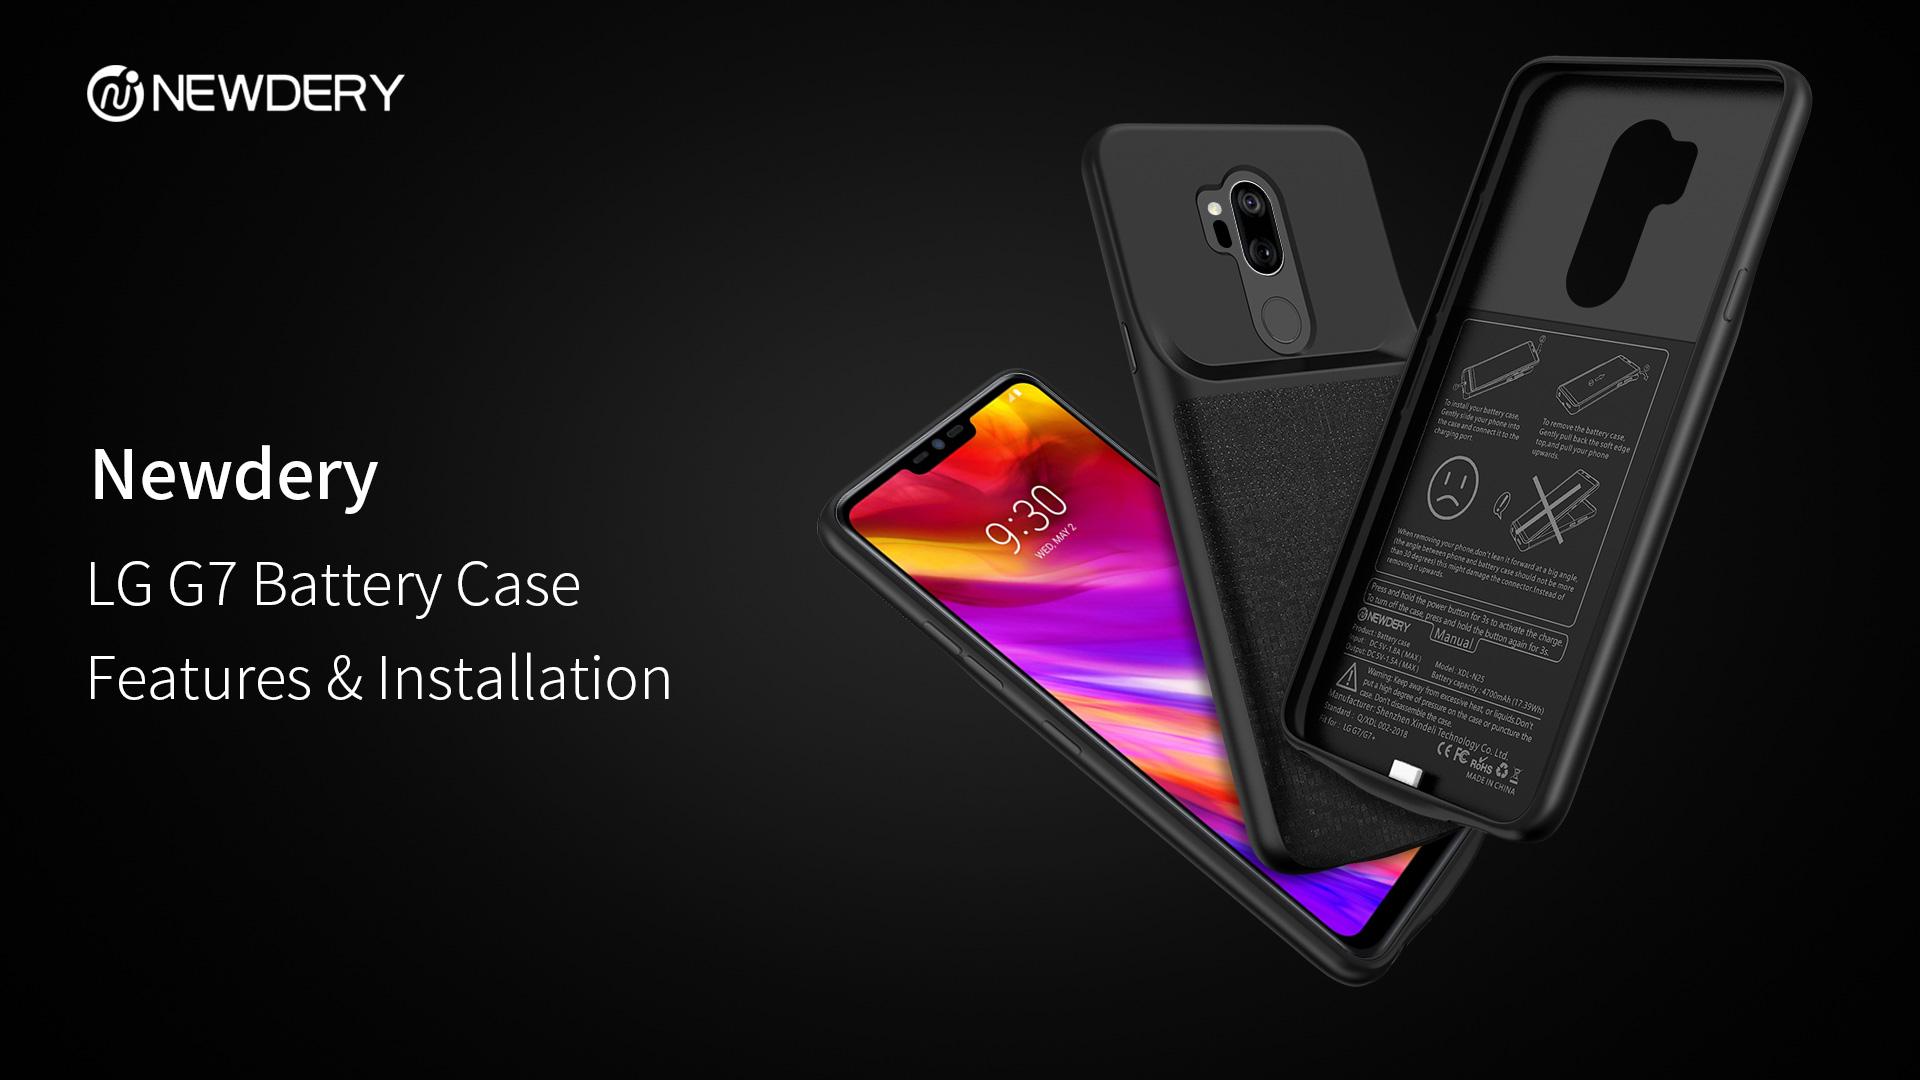 online retailer a64dd 7e22e Newdery LG G7 Thinq Battery Case